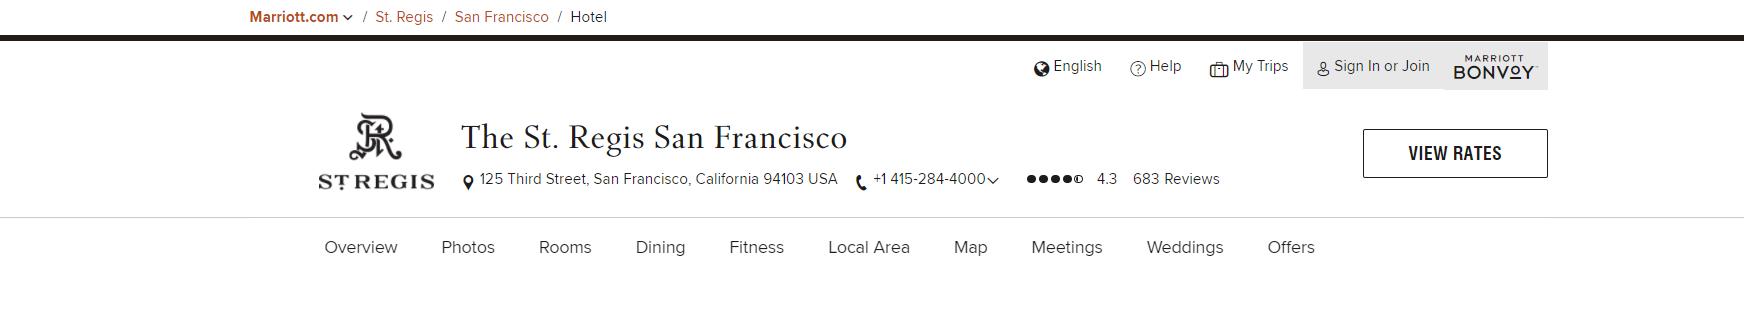 The St. Regis San Francisco